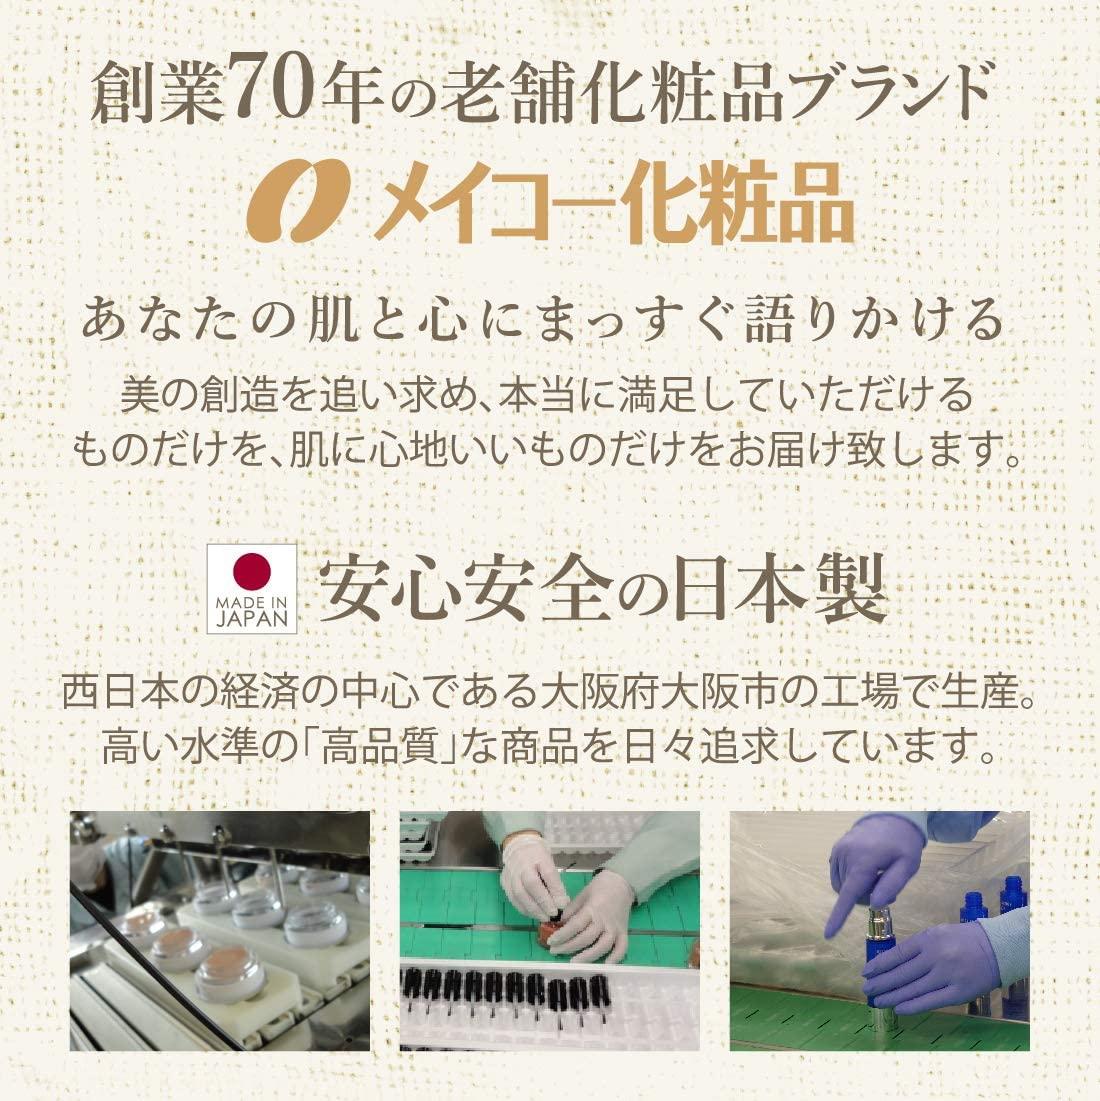 naturactor(ナチュラクター)フレッシュローション(ふきとり化粧水)の商品画像8